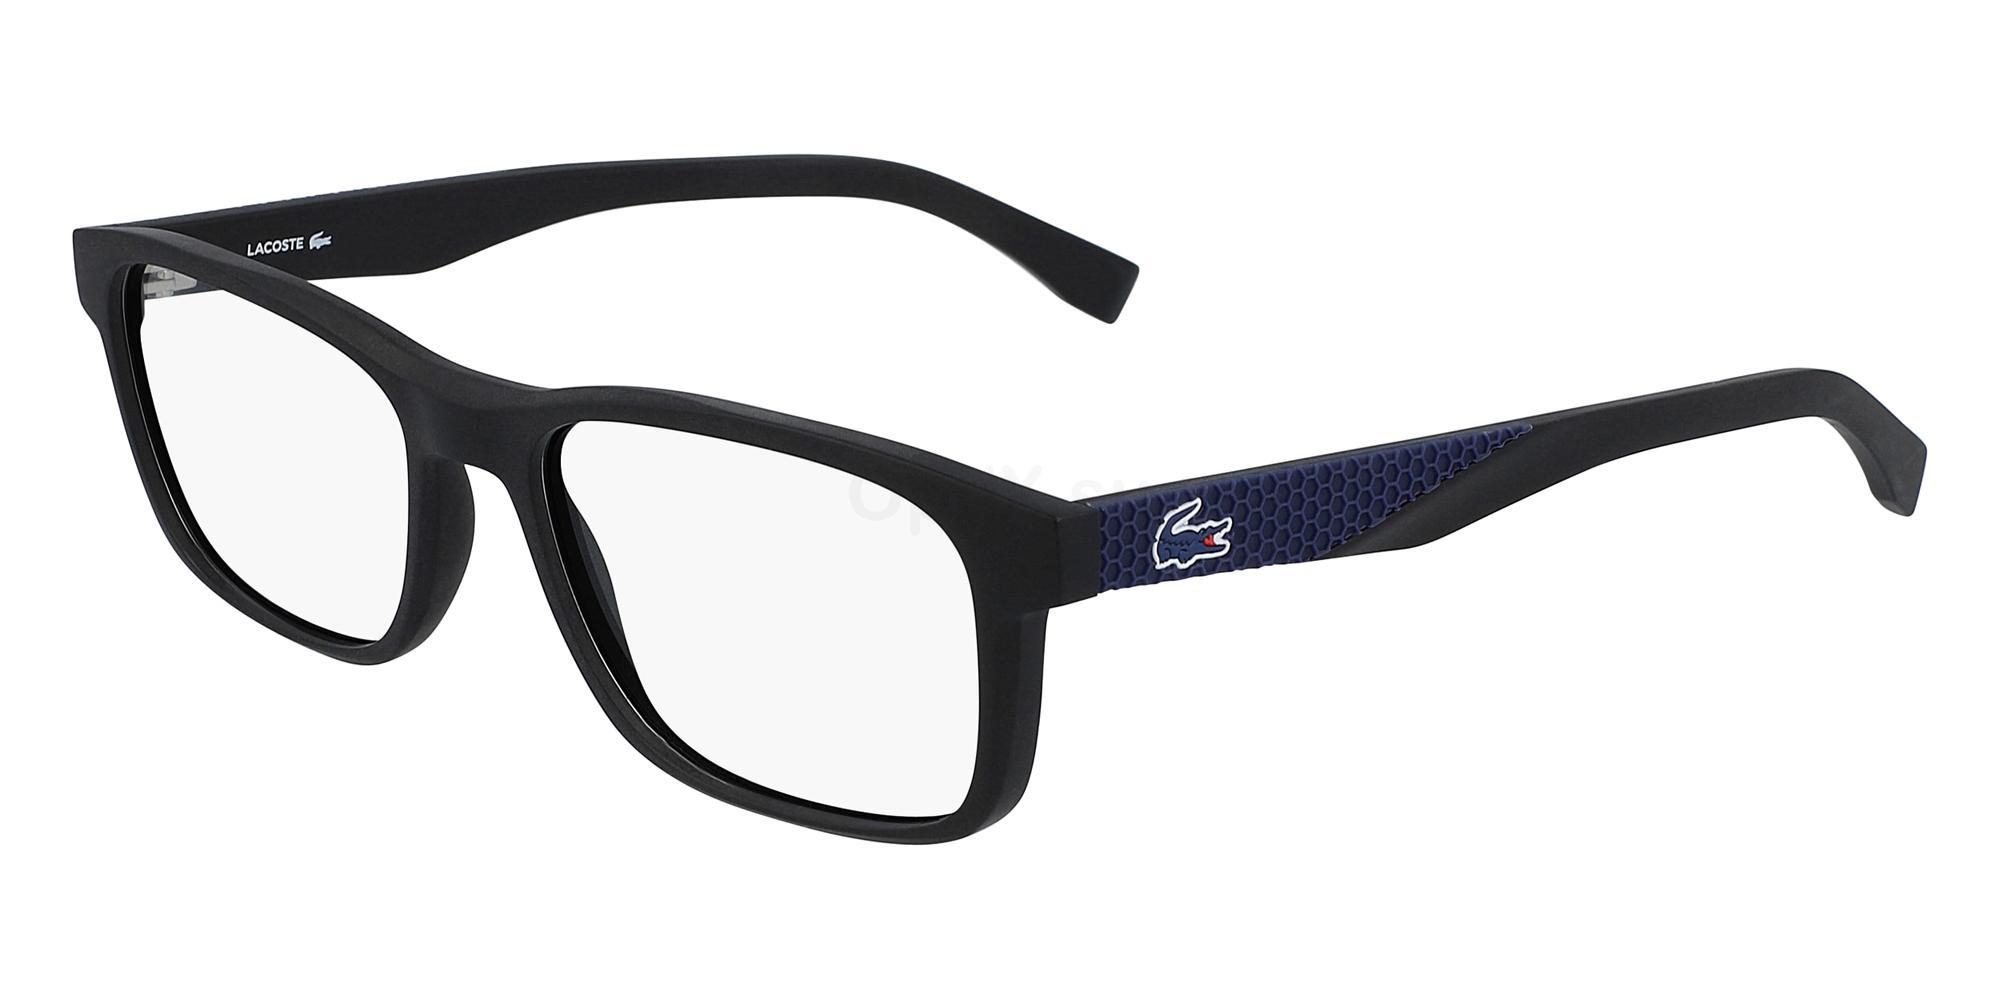 001 L2842 Glasses, Lacoste